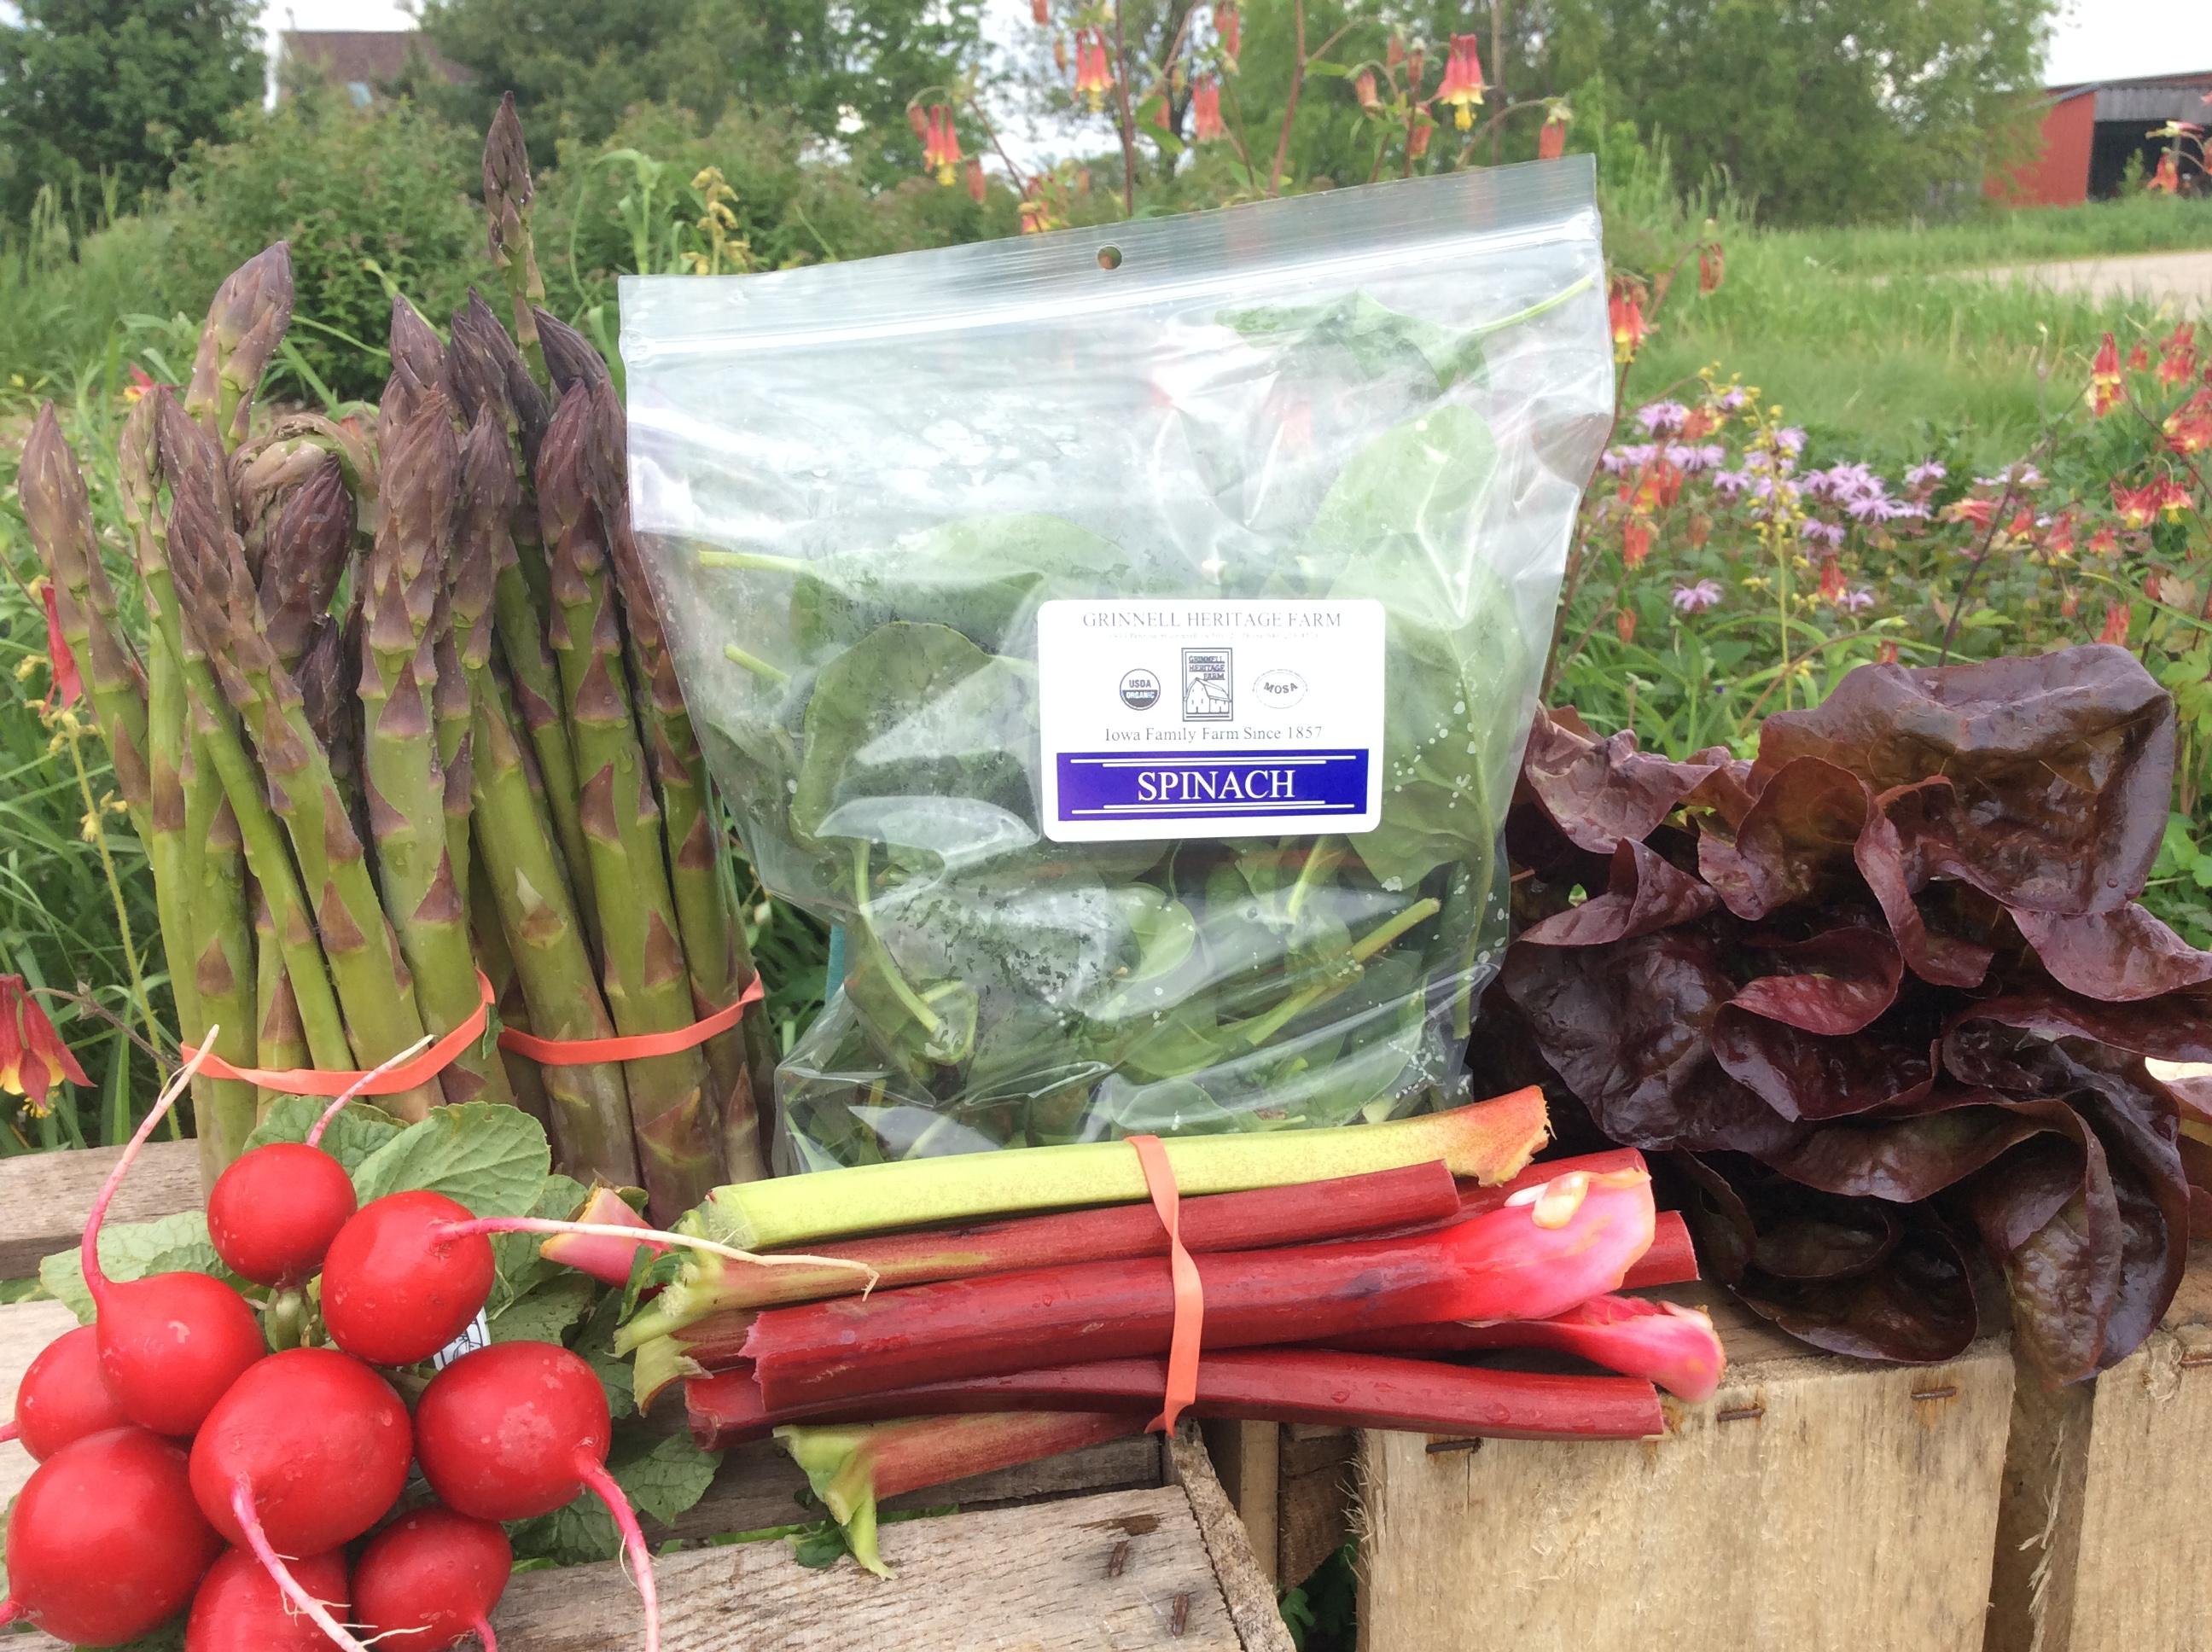 Grinnell Heritage Farm - Spring CSA - Week 4